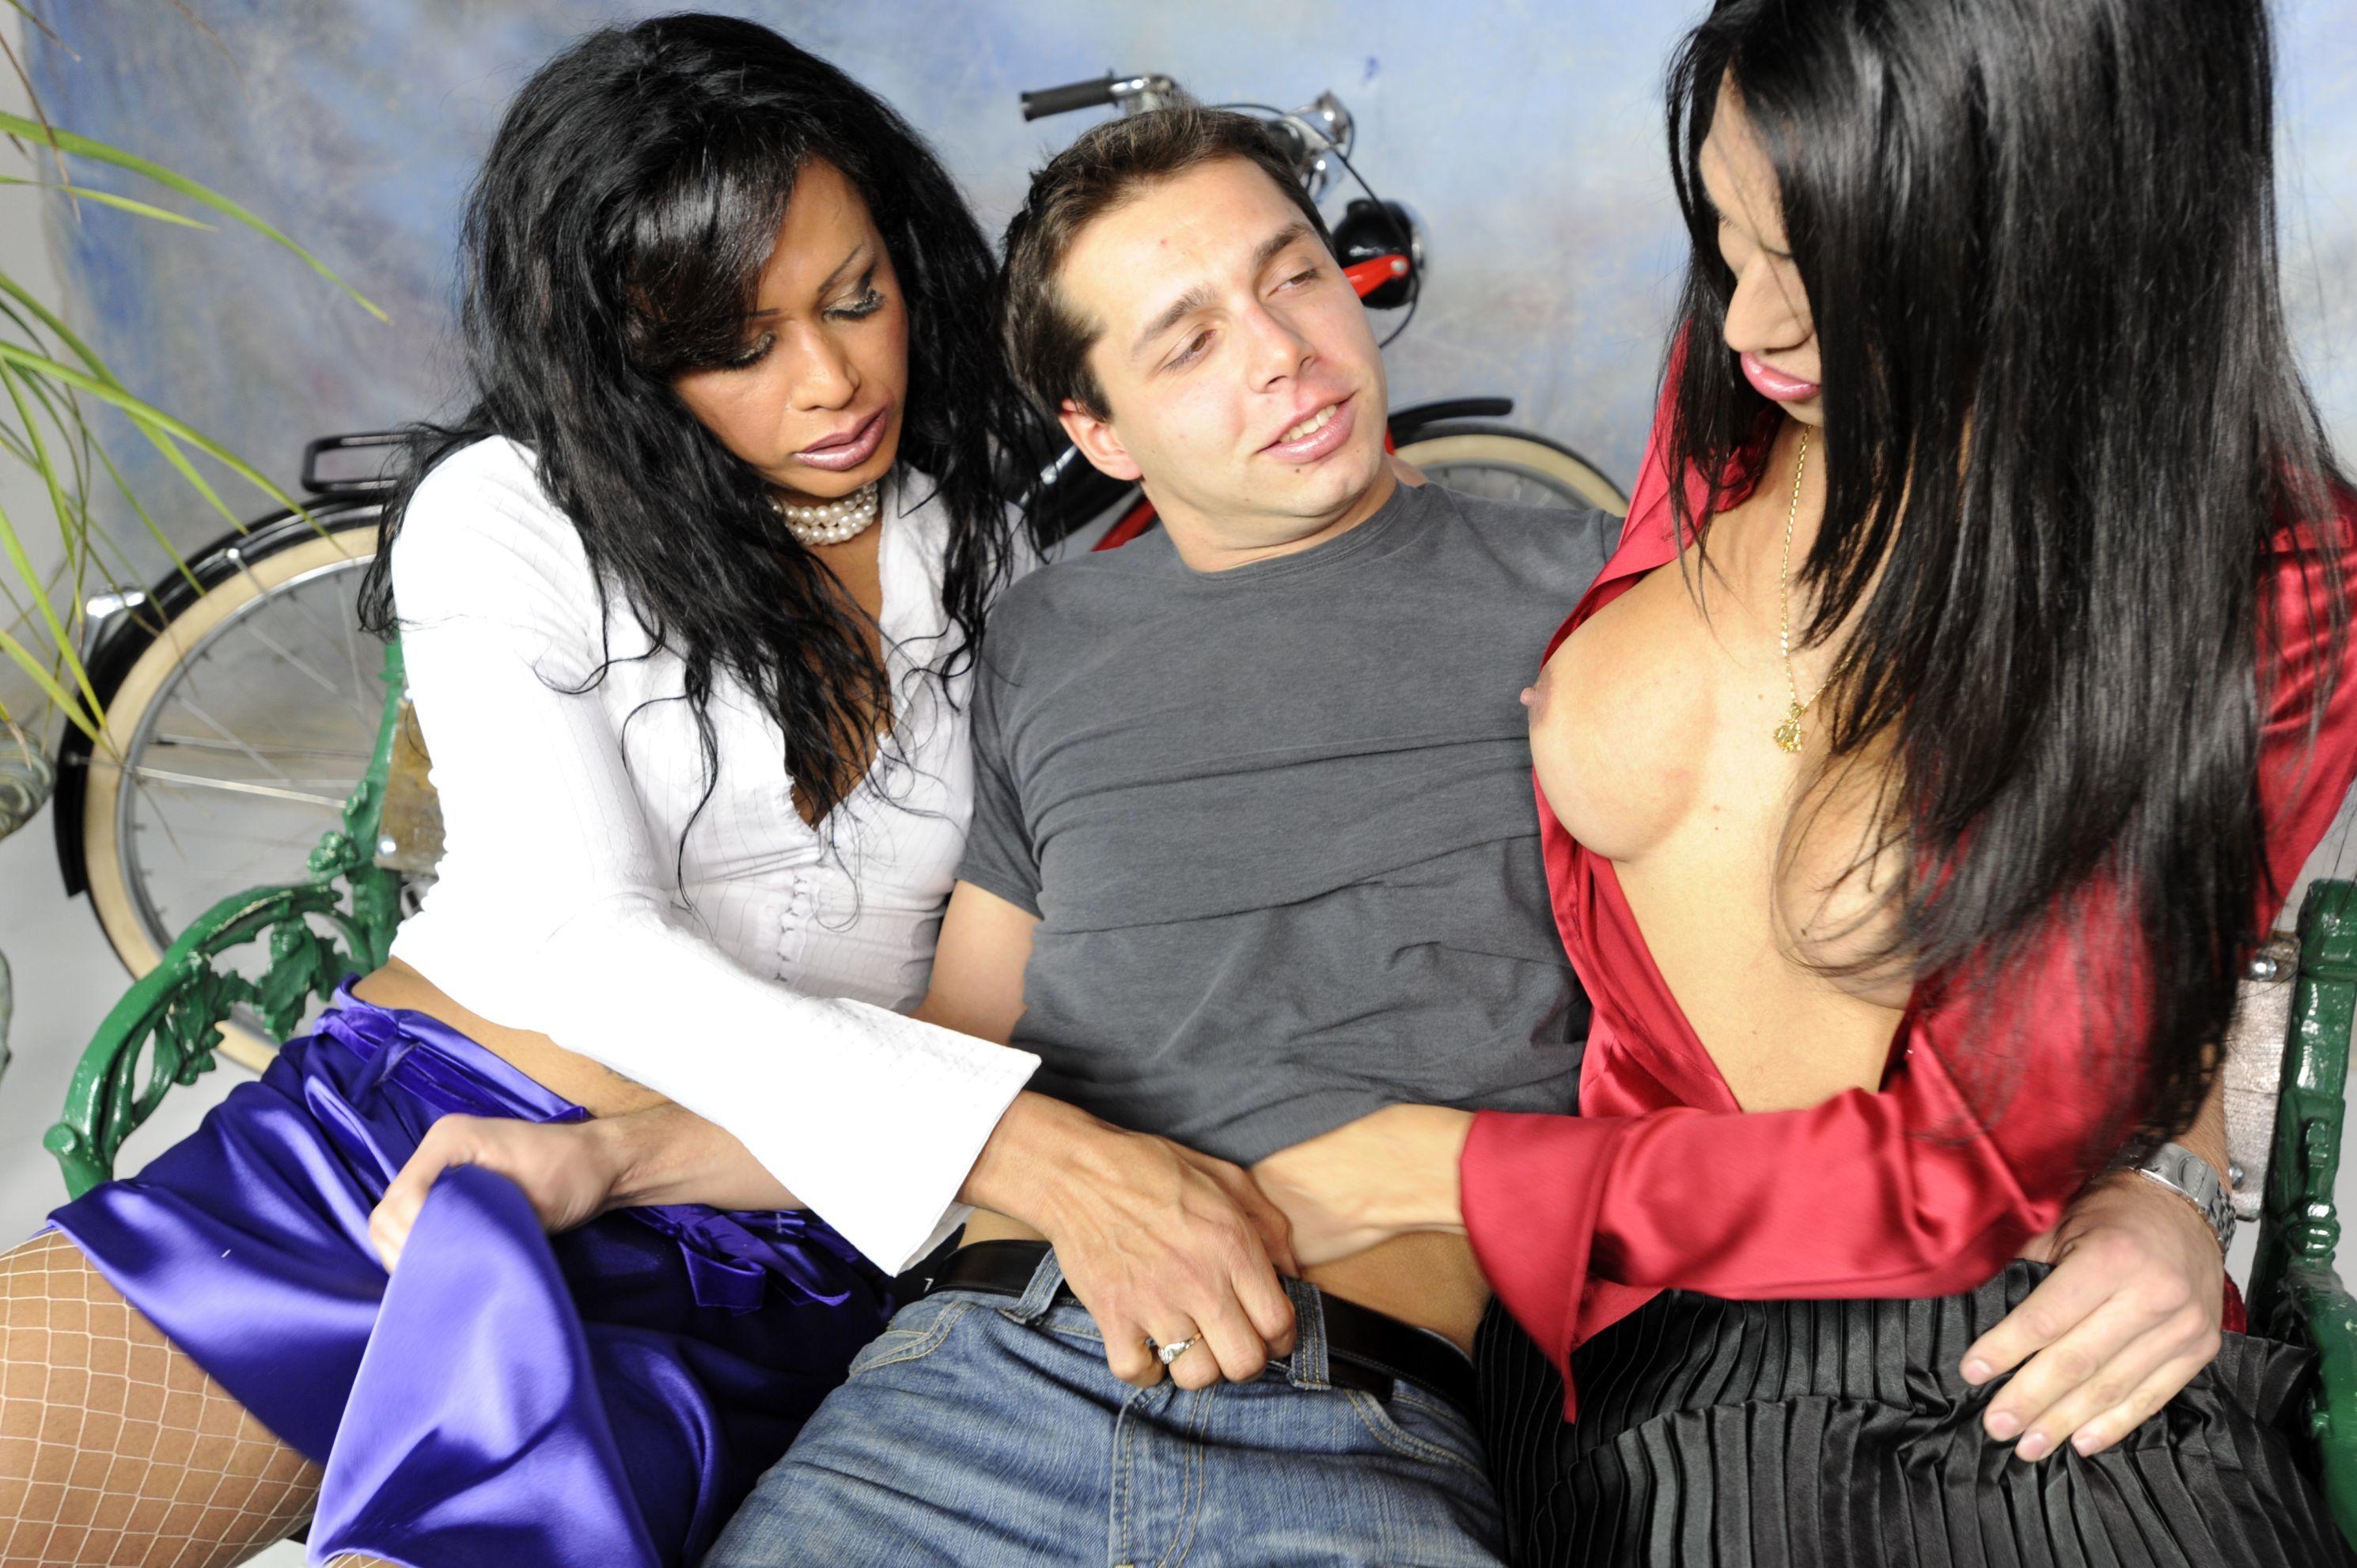 Flirtatious TGirl And Gay Man